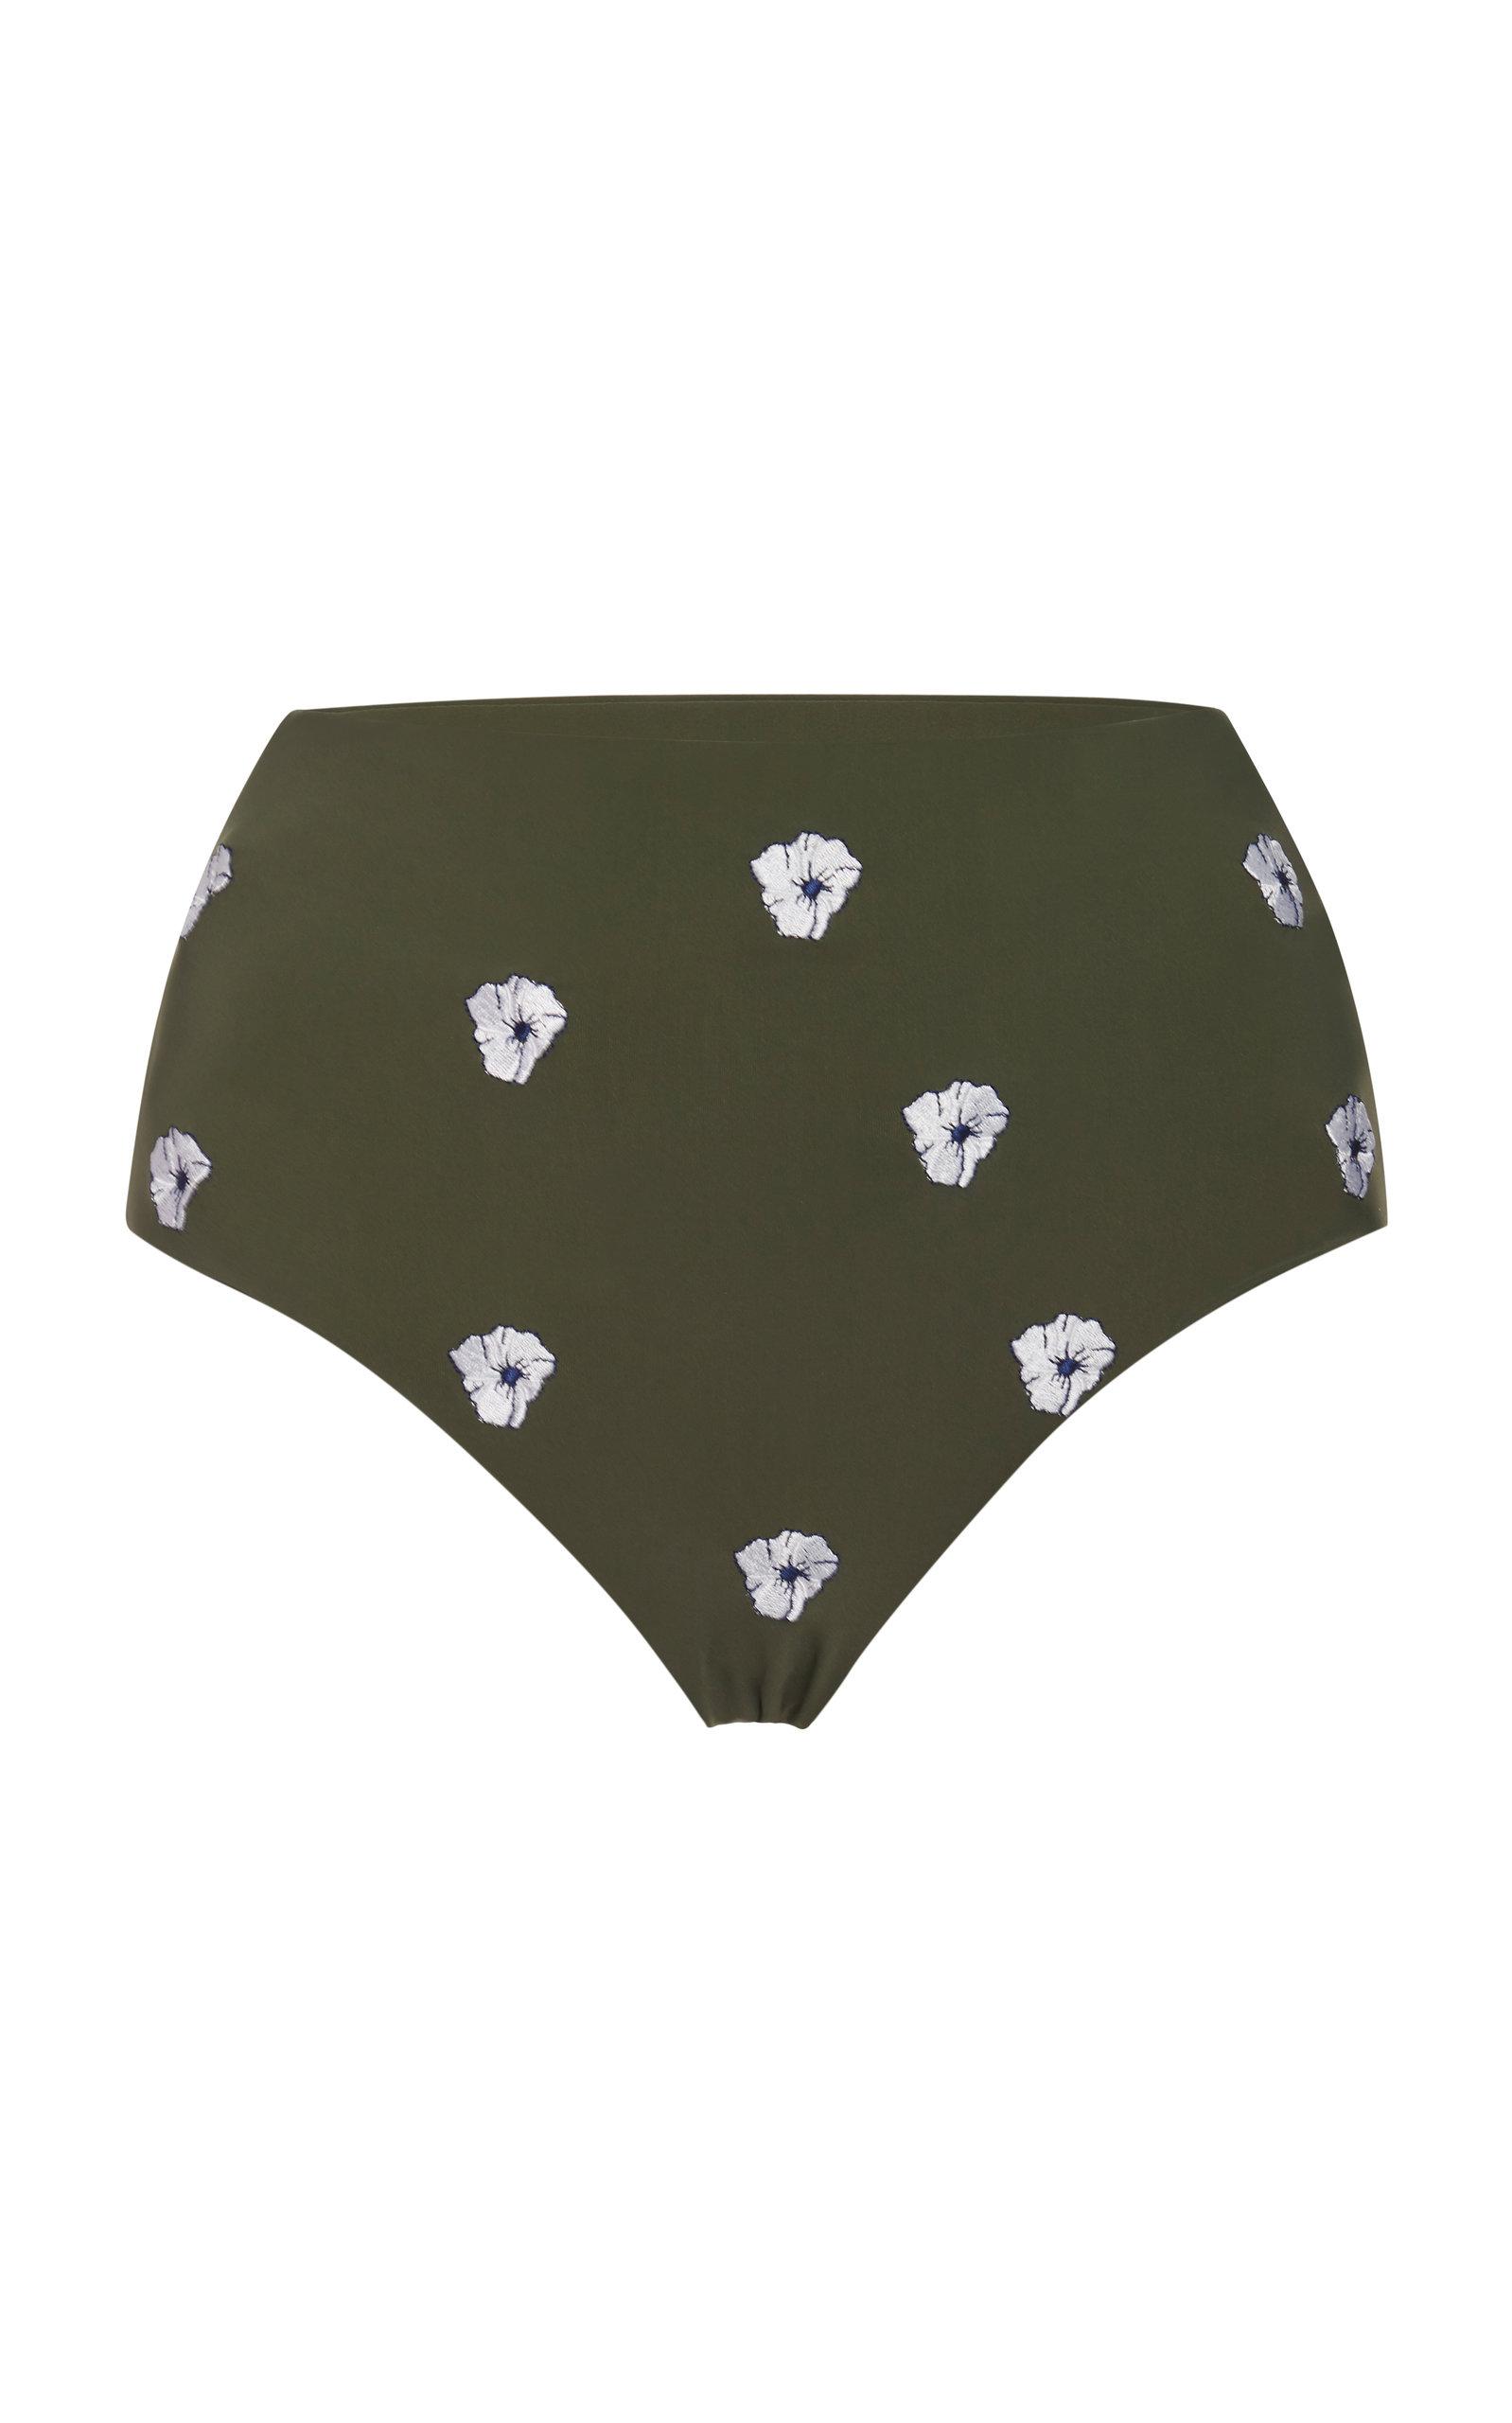 ea5bc4bfbde Embroidered High-Rise Bikini Bottom